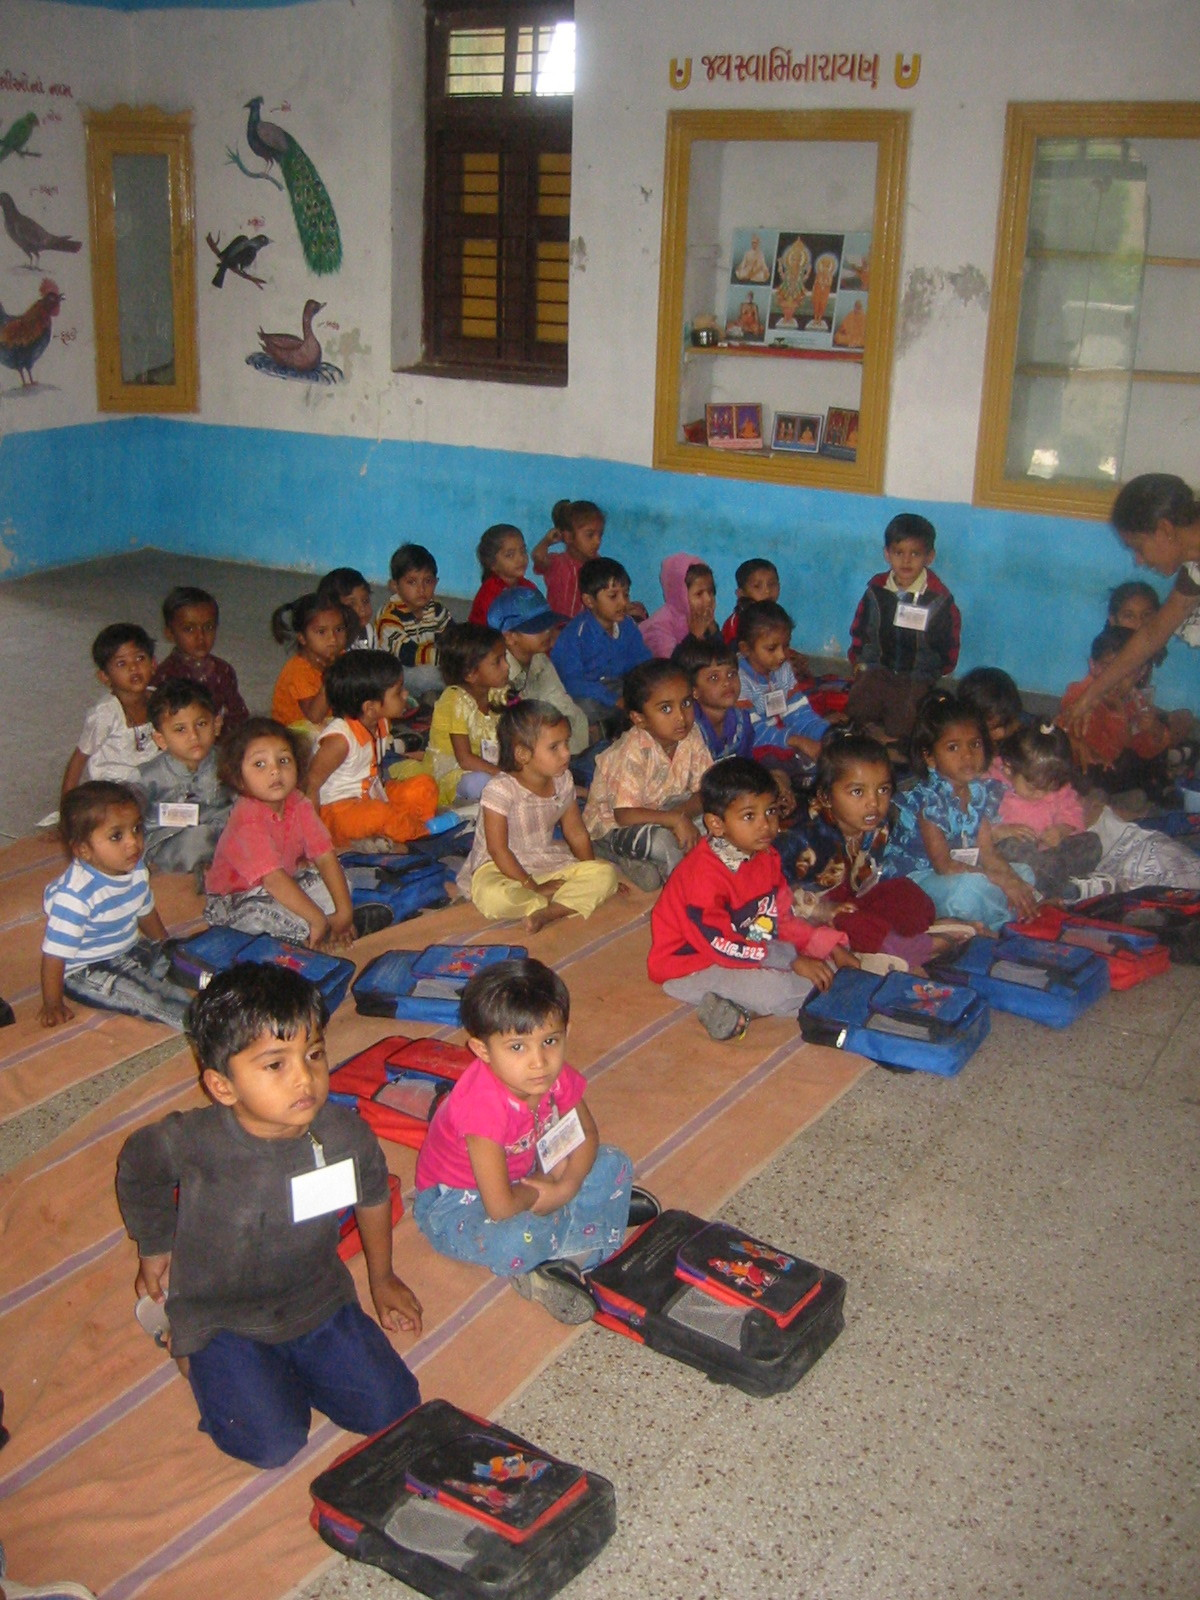 sunset cooperative preschool nursery school images pictures thenurseries 158